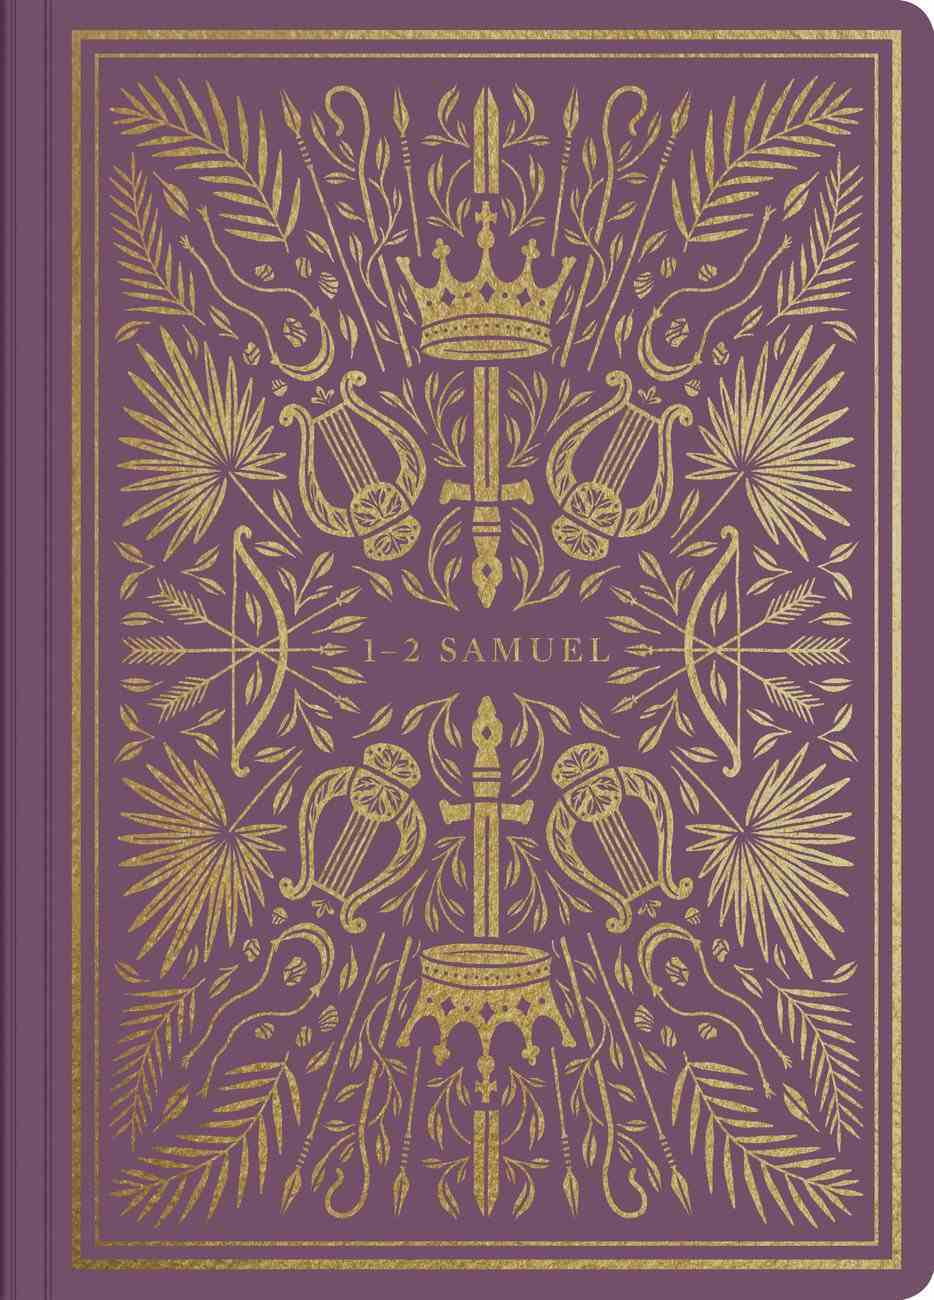 ESV Illuminated Scripture Journal 1-2 Samuel (Black Letter Edition) Paperback